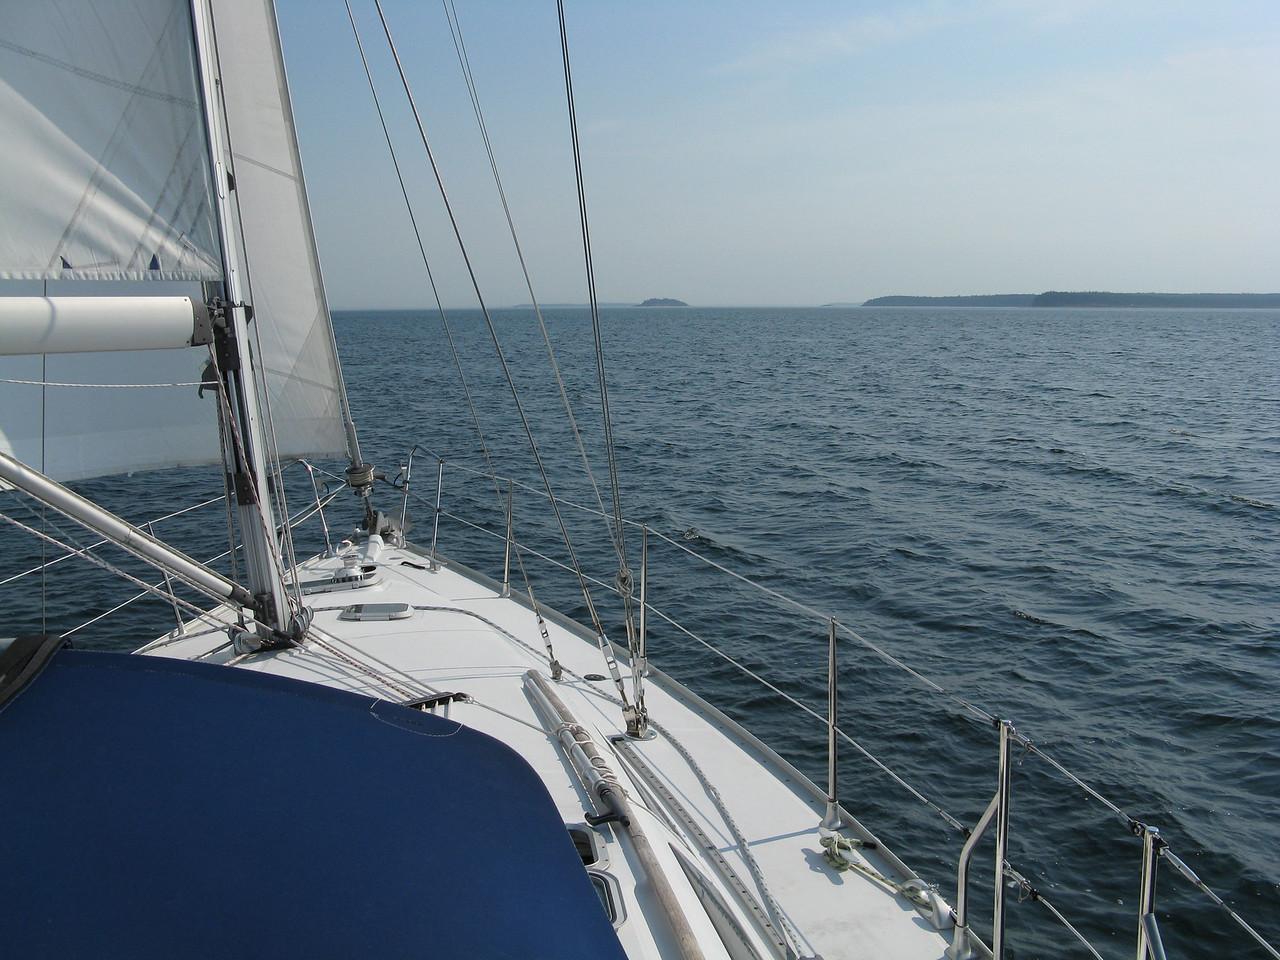 09 07 26-08 02 Sail SJ 225